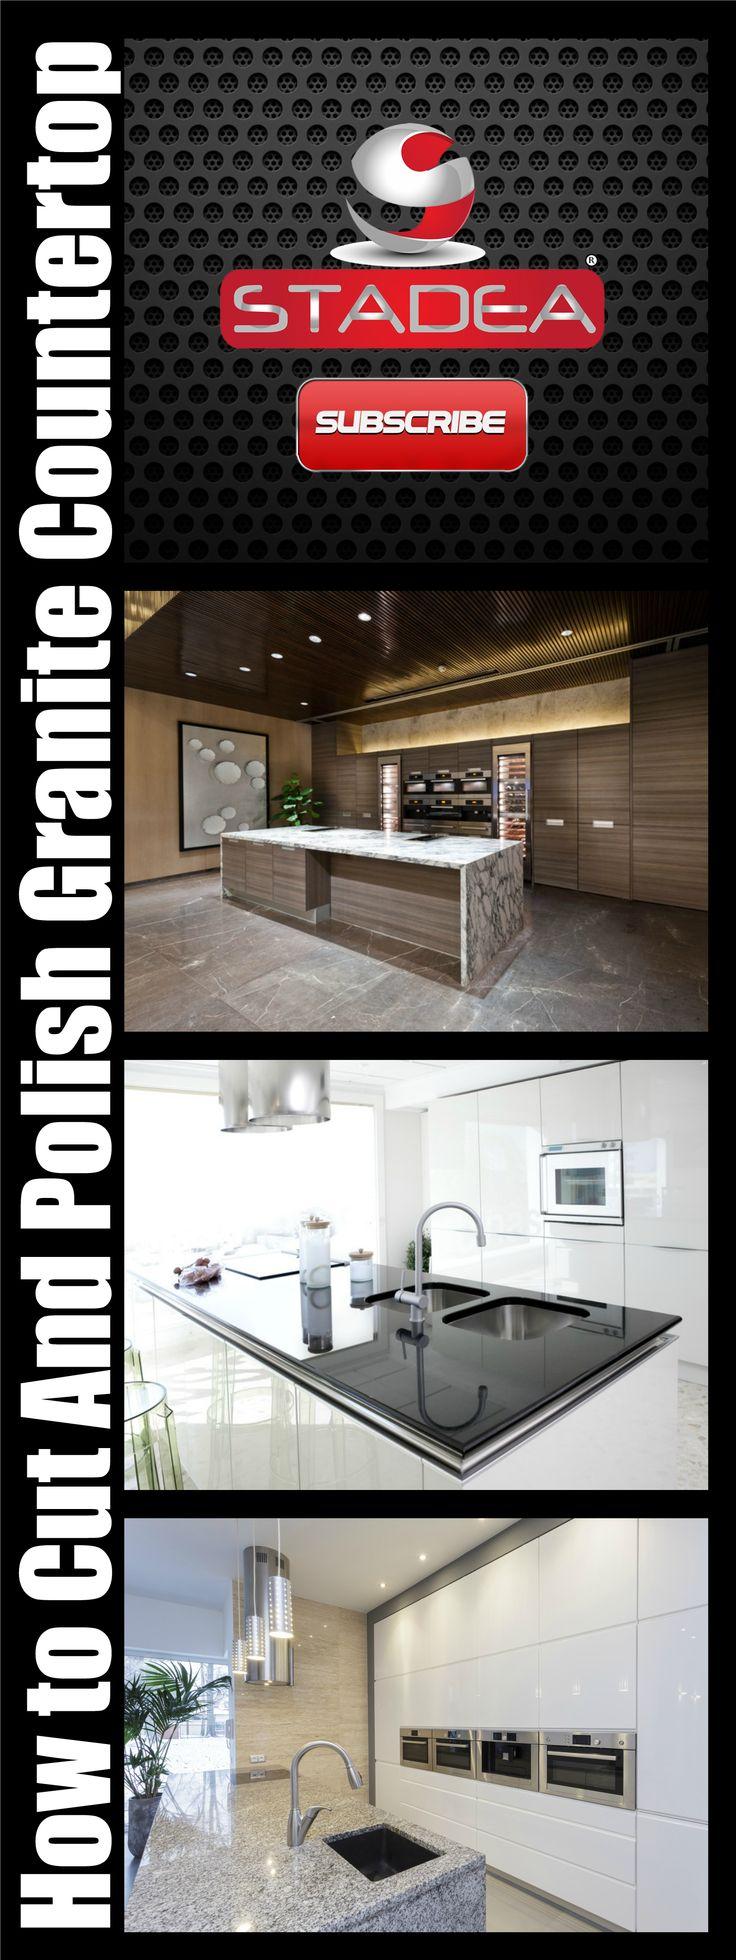 Best 25+ How to polish granite ideas on Pinterest